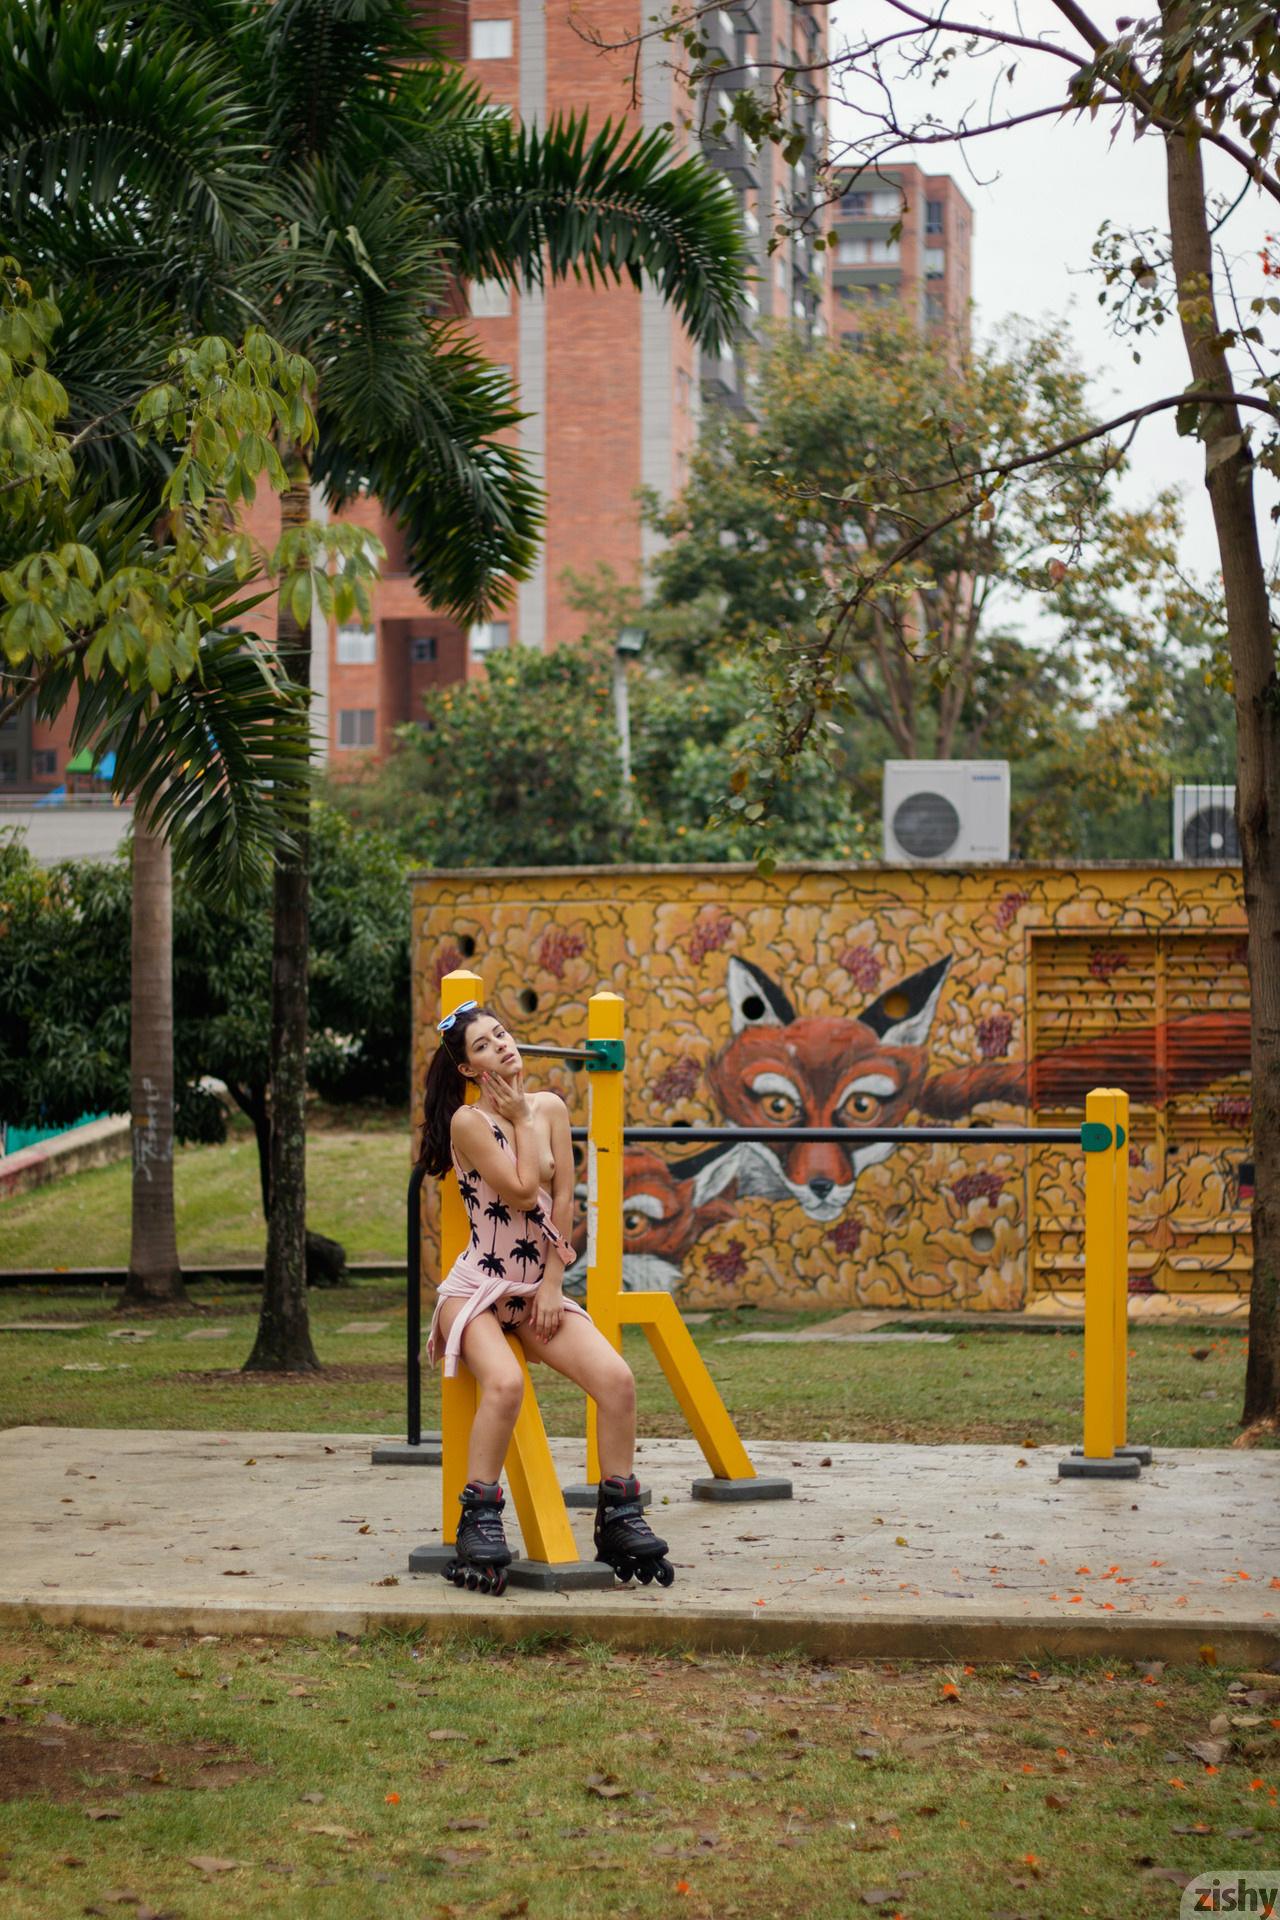 Kate Maze Skates Colombia Zishy (56)